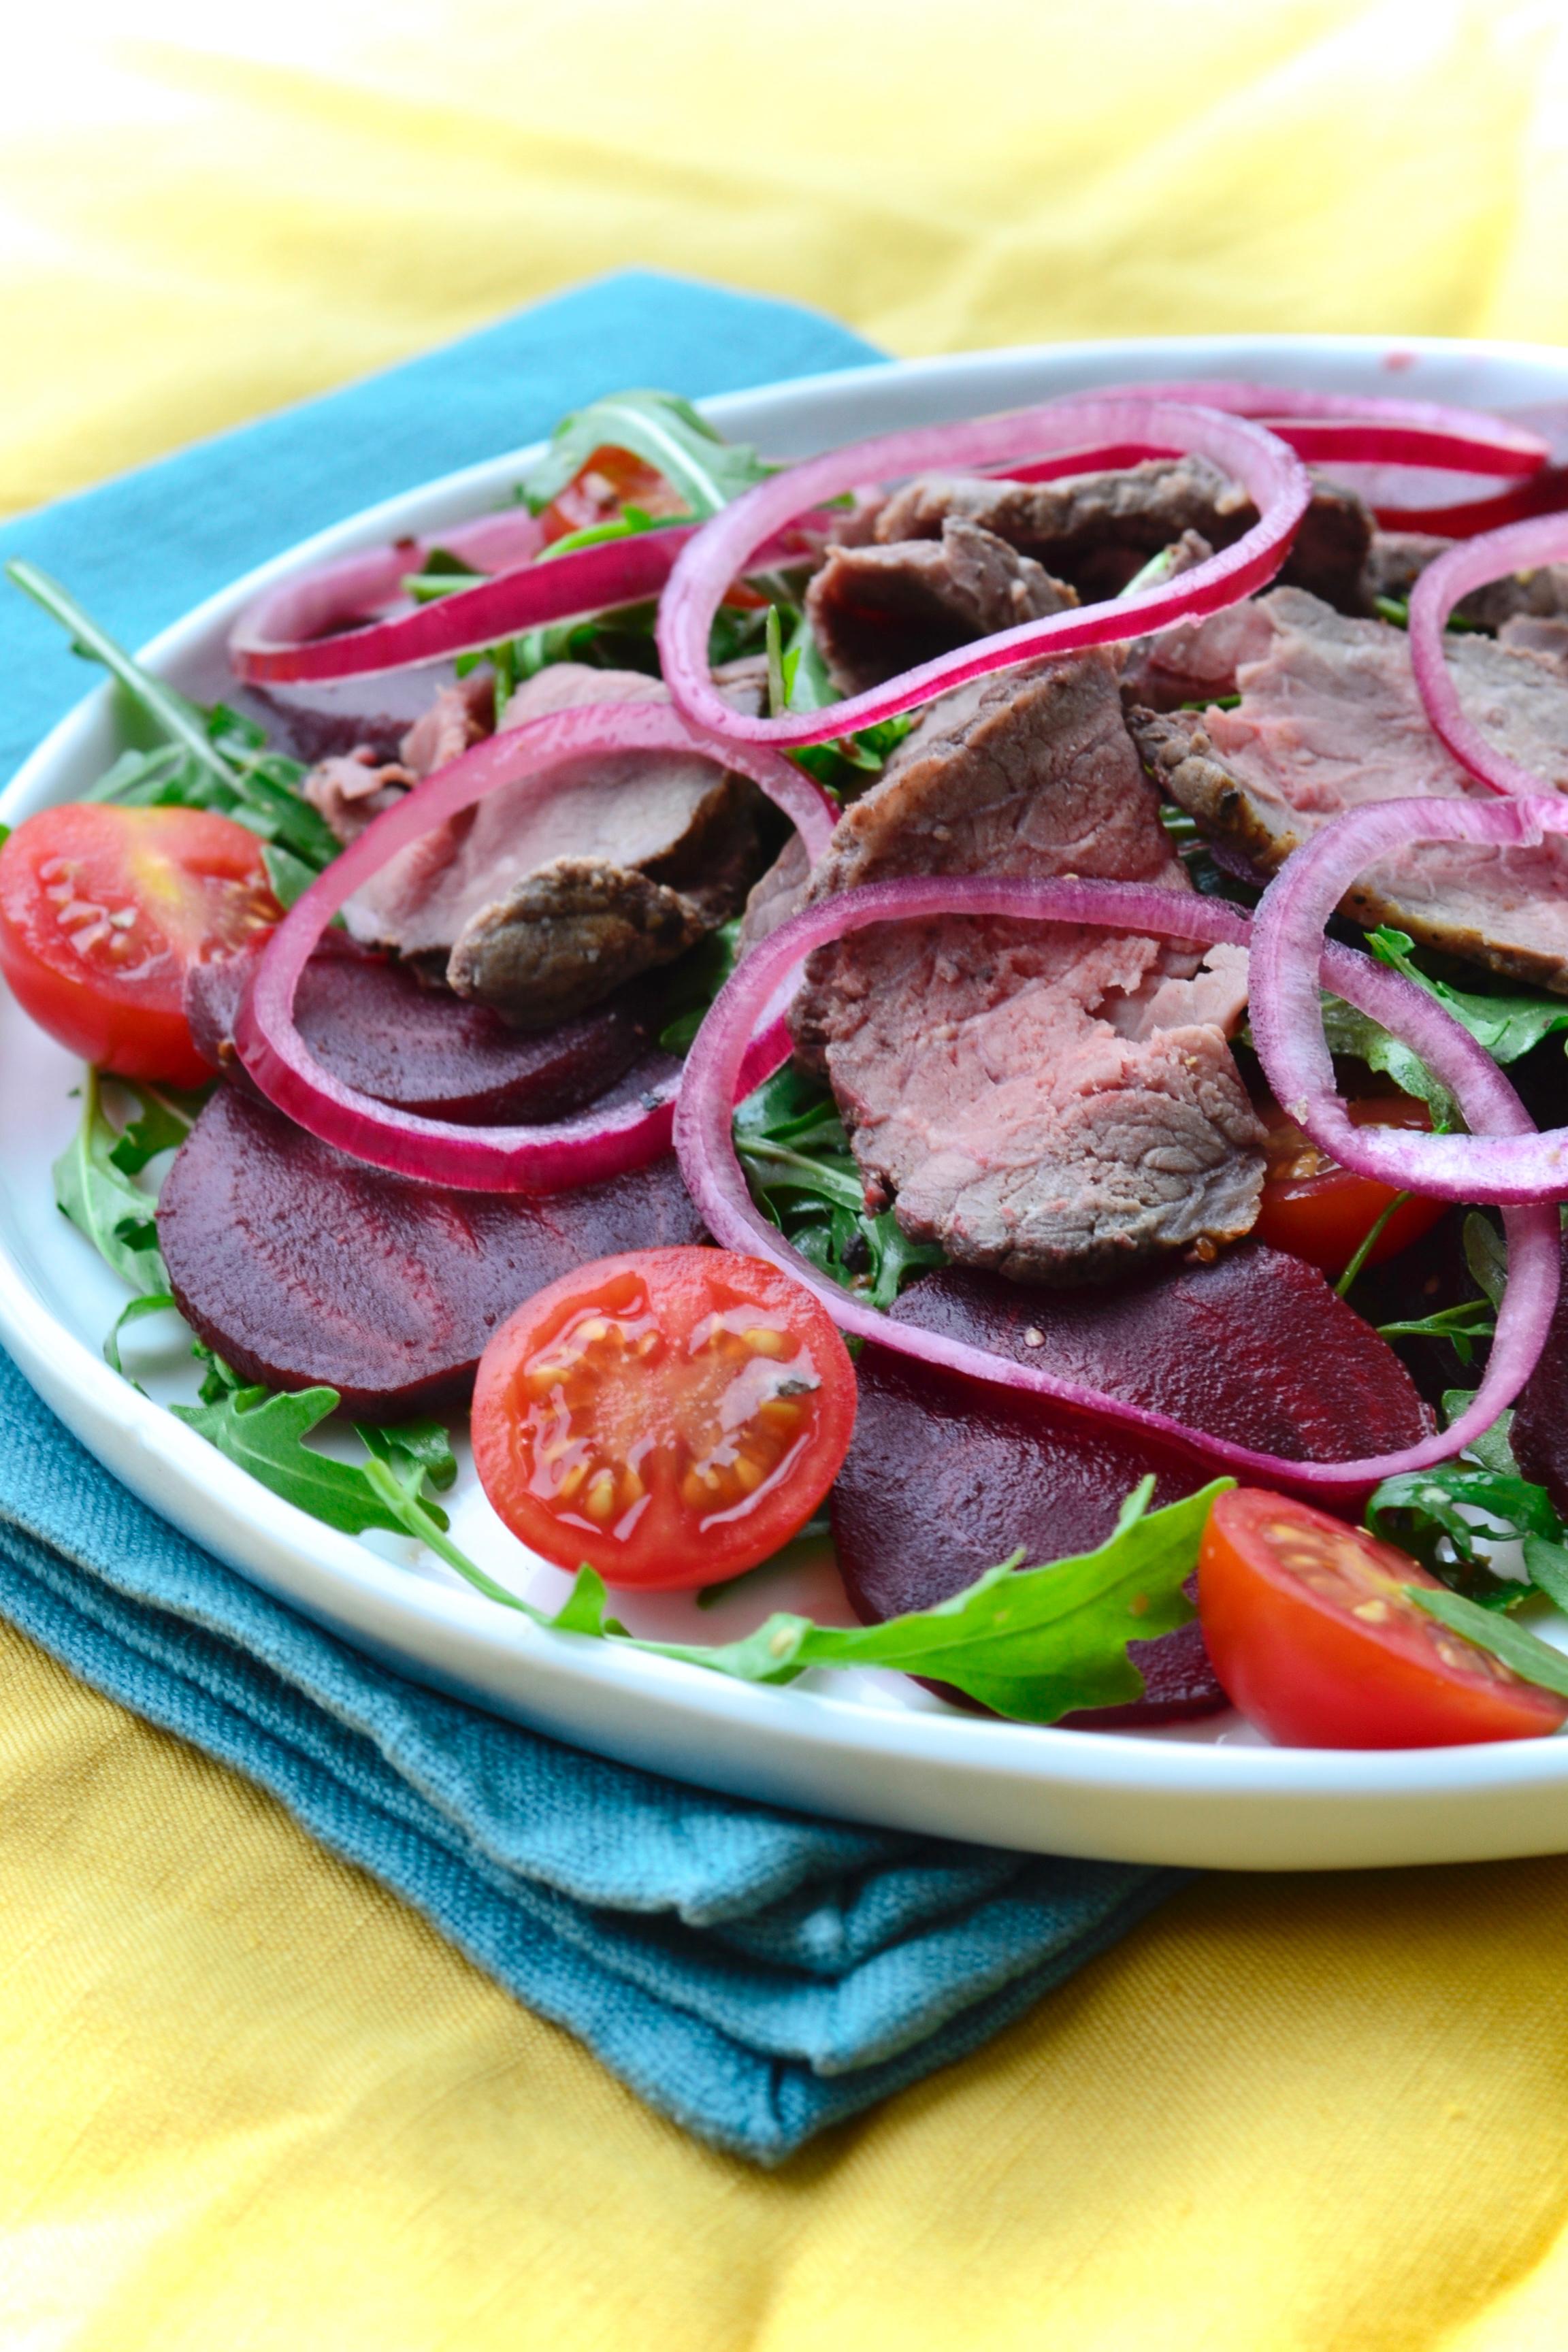 Gt roast beef salad Gastrogays 2